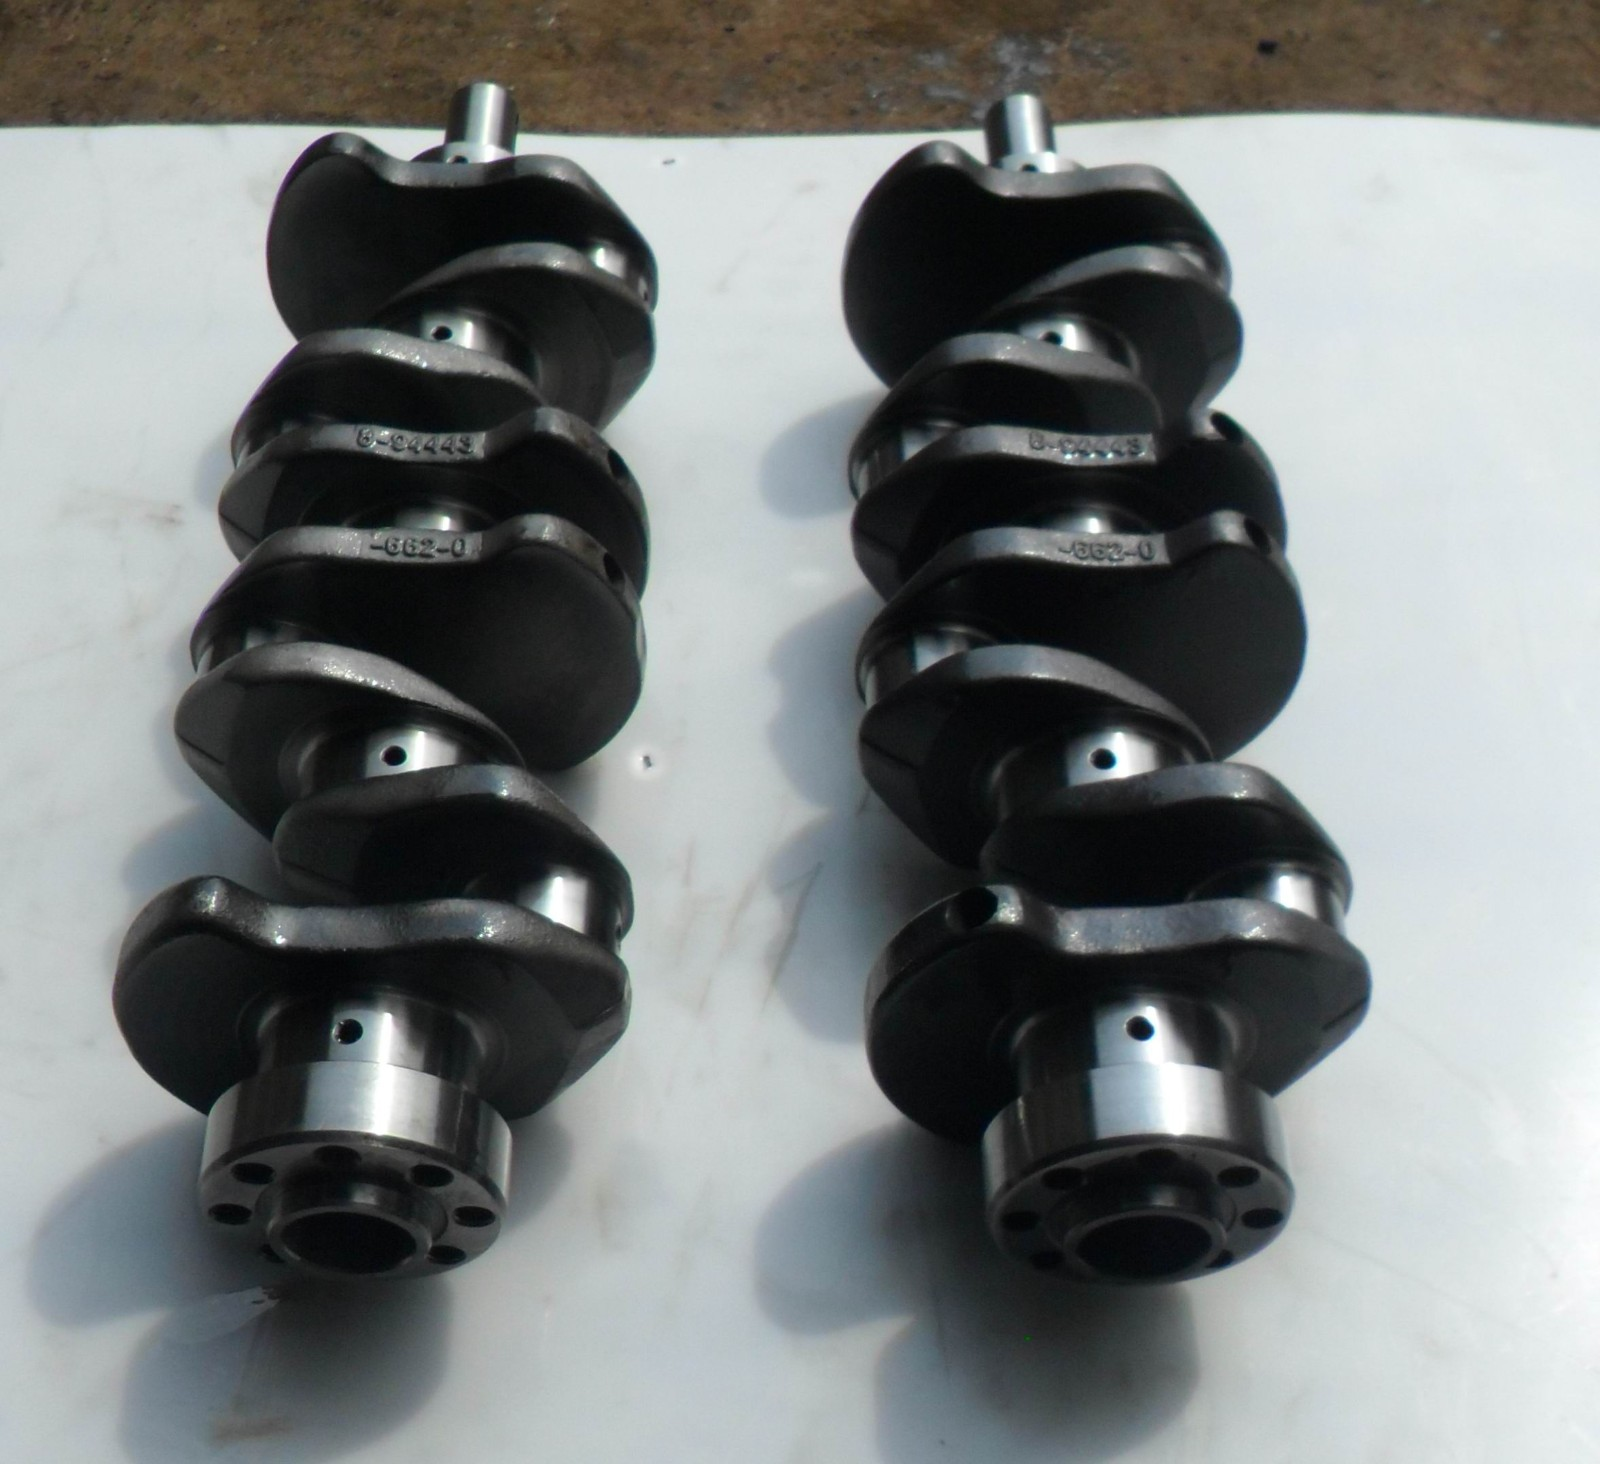 Crankshaft for ISUZU 4JH1 4Kh1 8-97254611-1-8-97940-743-0-8-97249-041-1